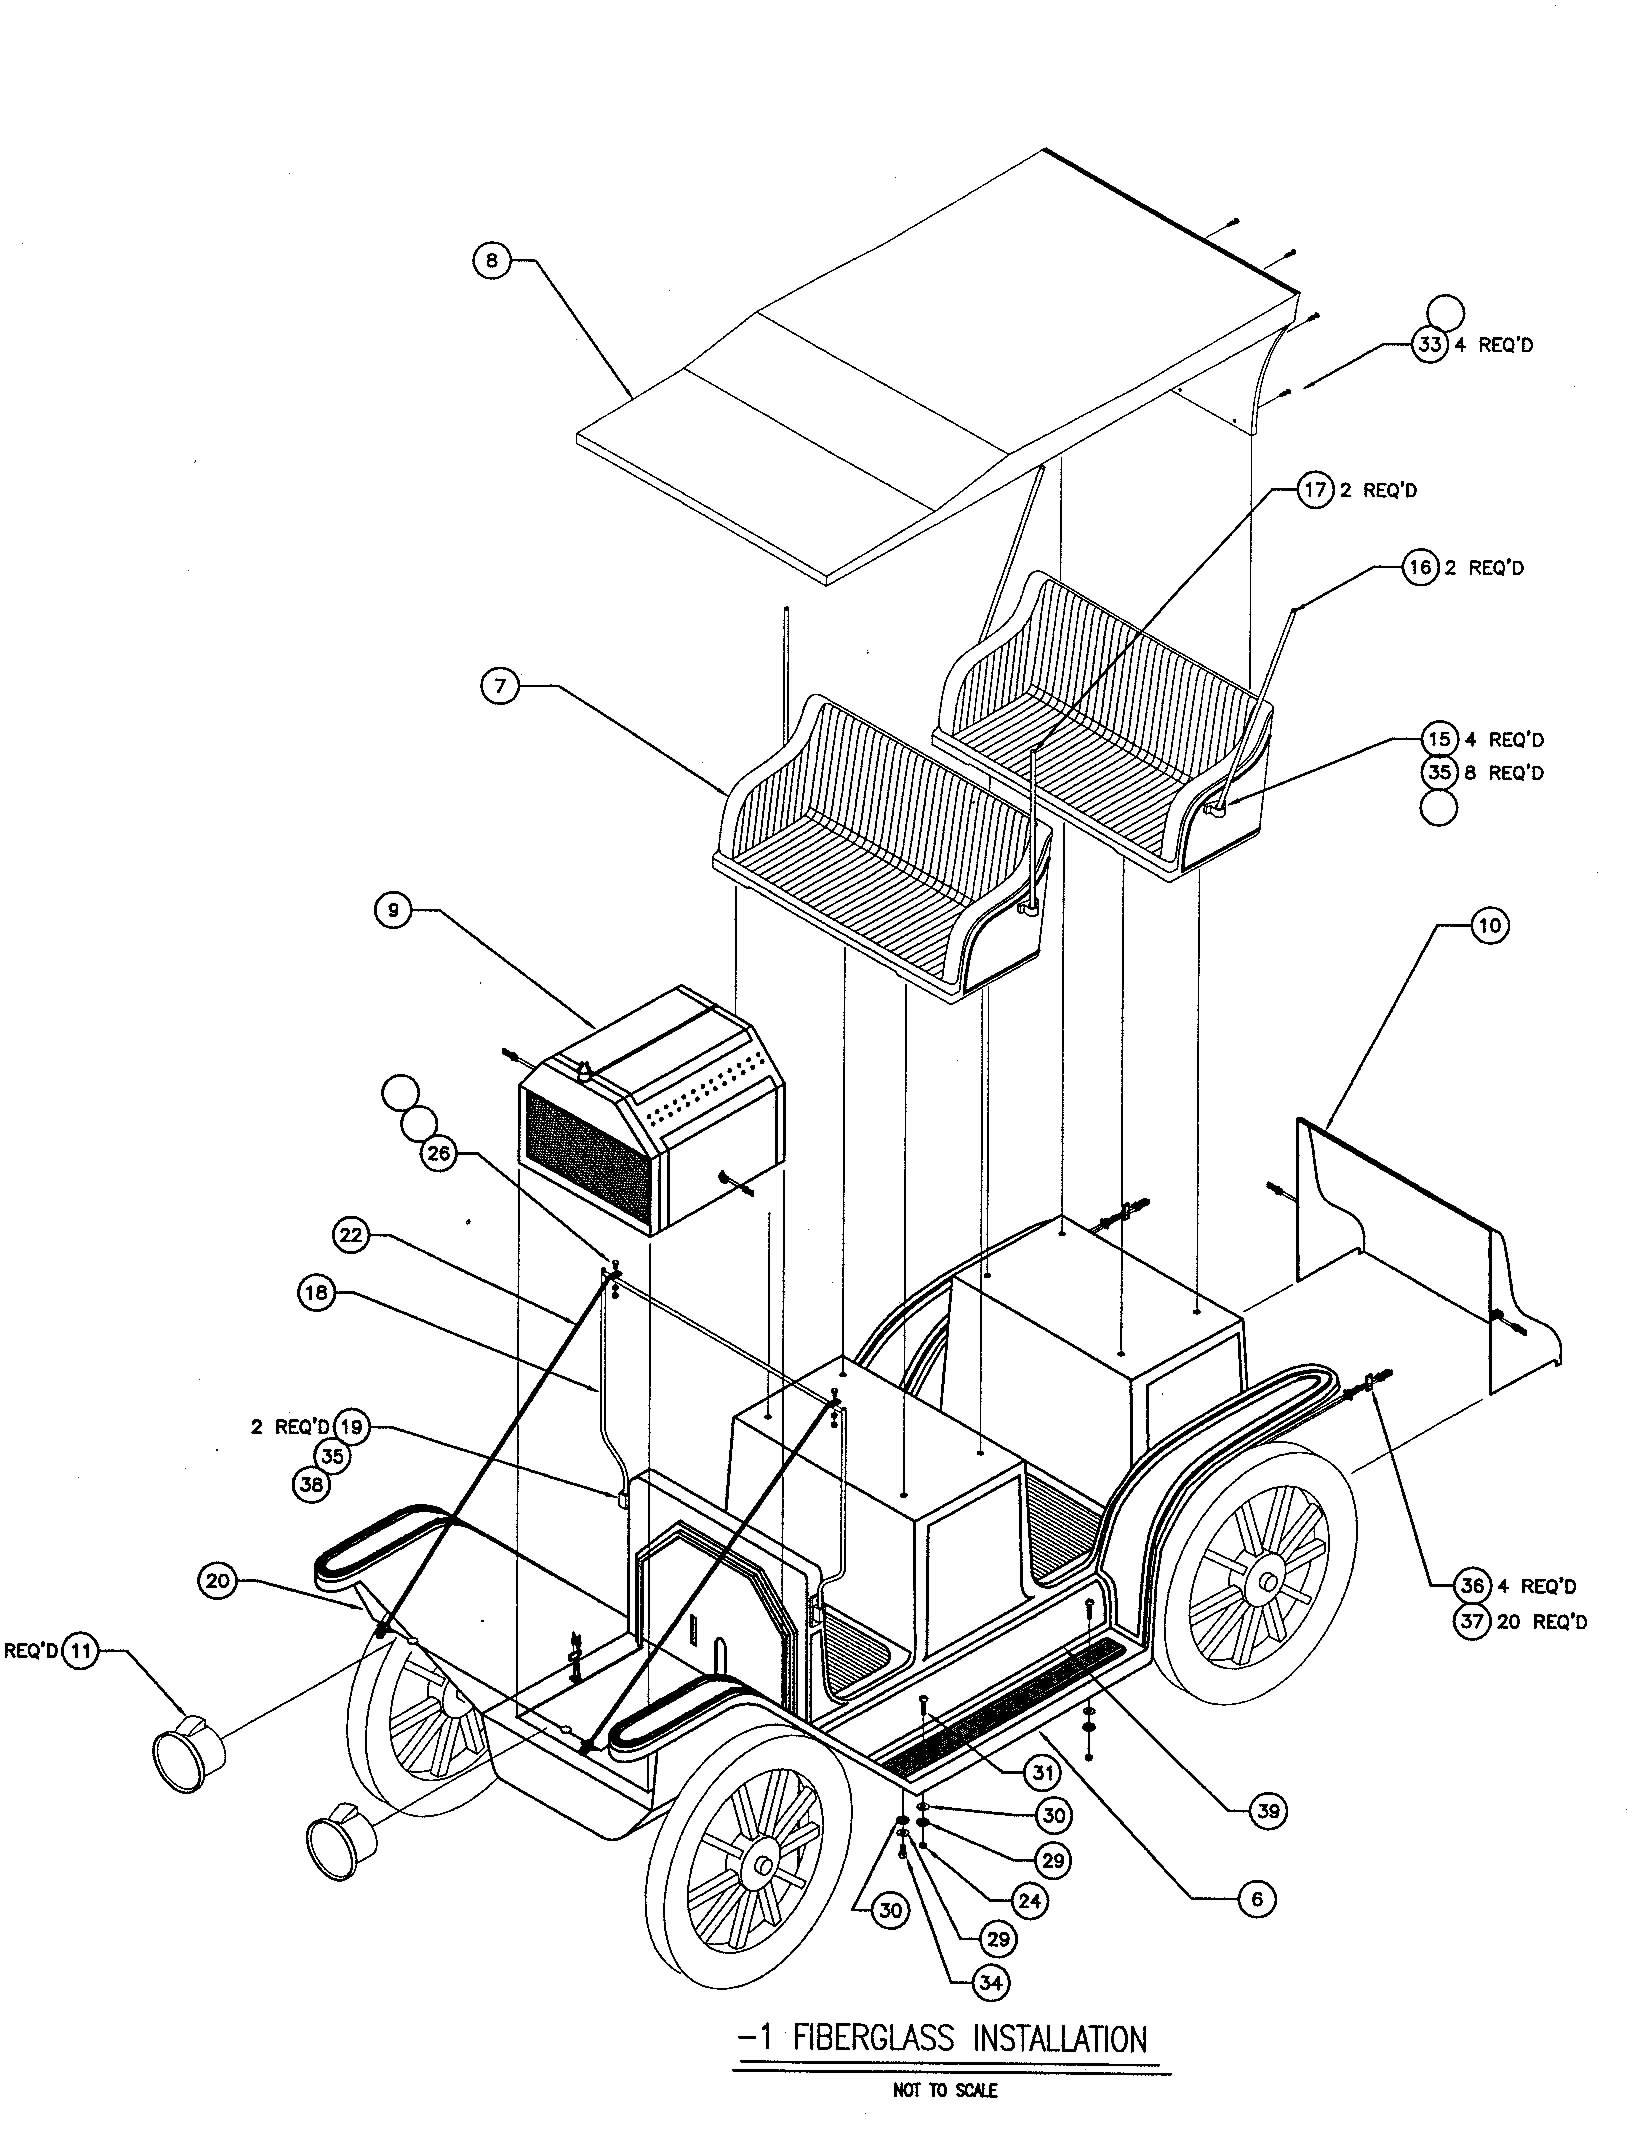 aviation drawings methods of illustration diagrams